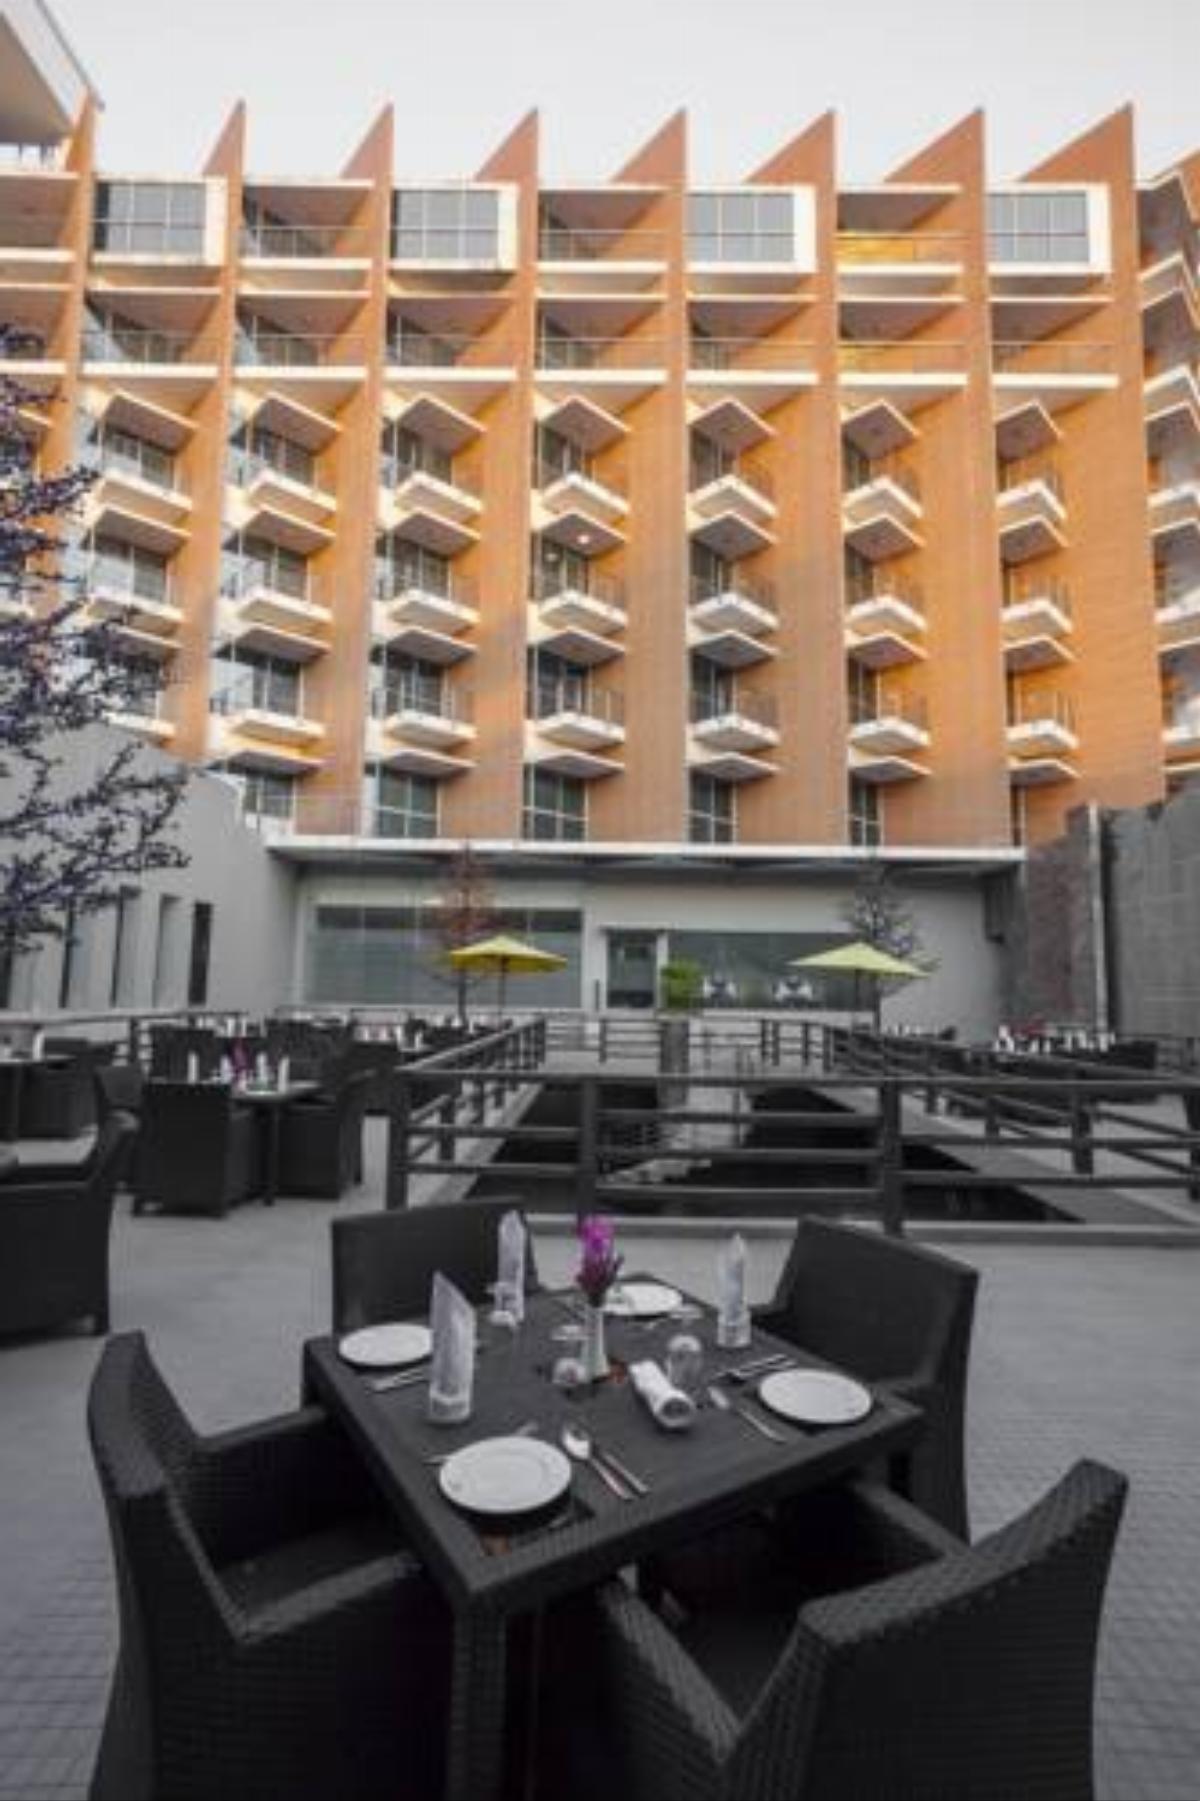 Long Beach Hotel Hotel, Cox's Bazar, Bangladesh